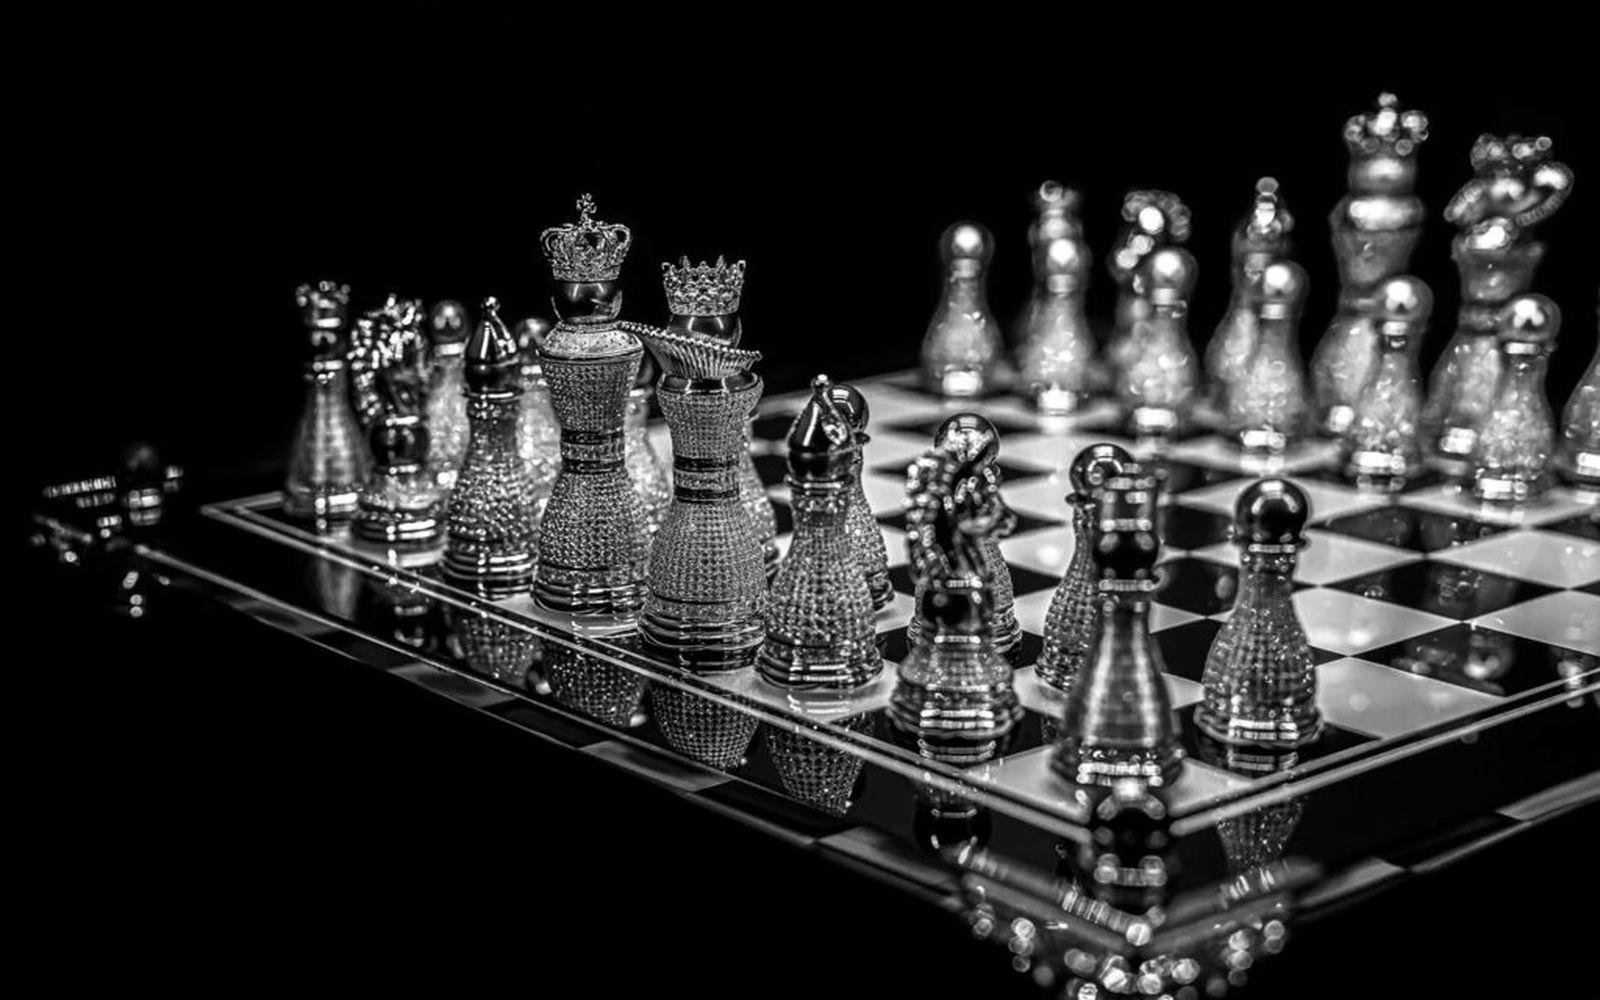 ismerd sakkfigurák)